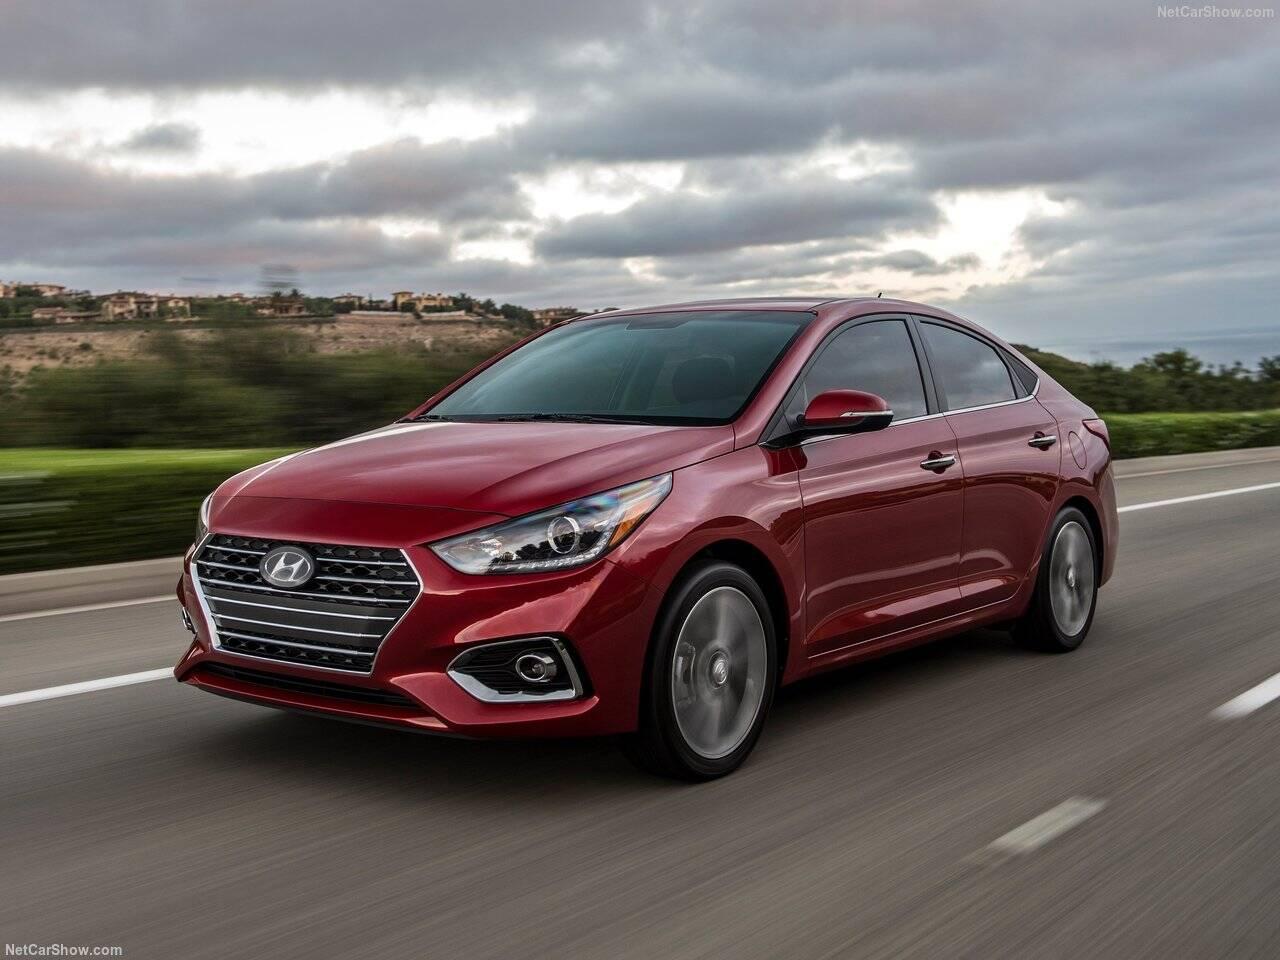 Hyundai-Accent-2018-1280-05